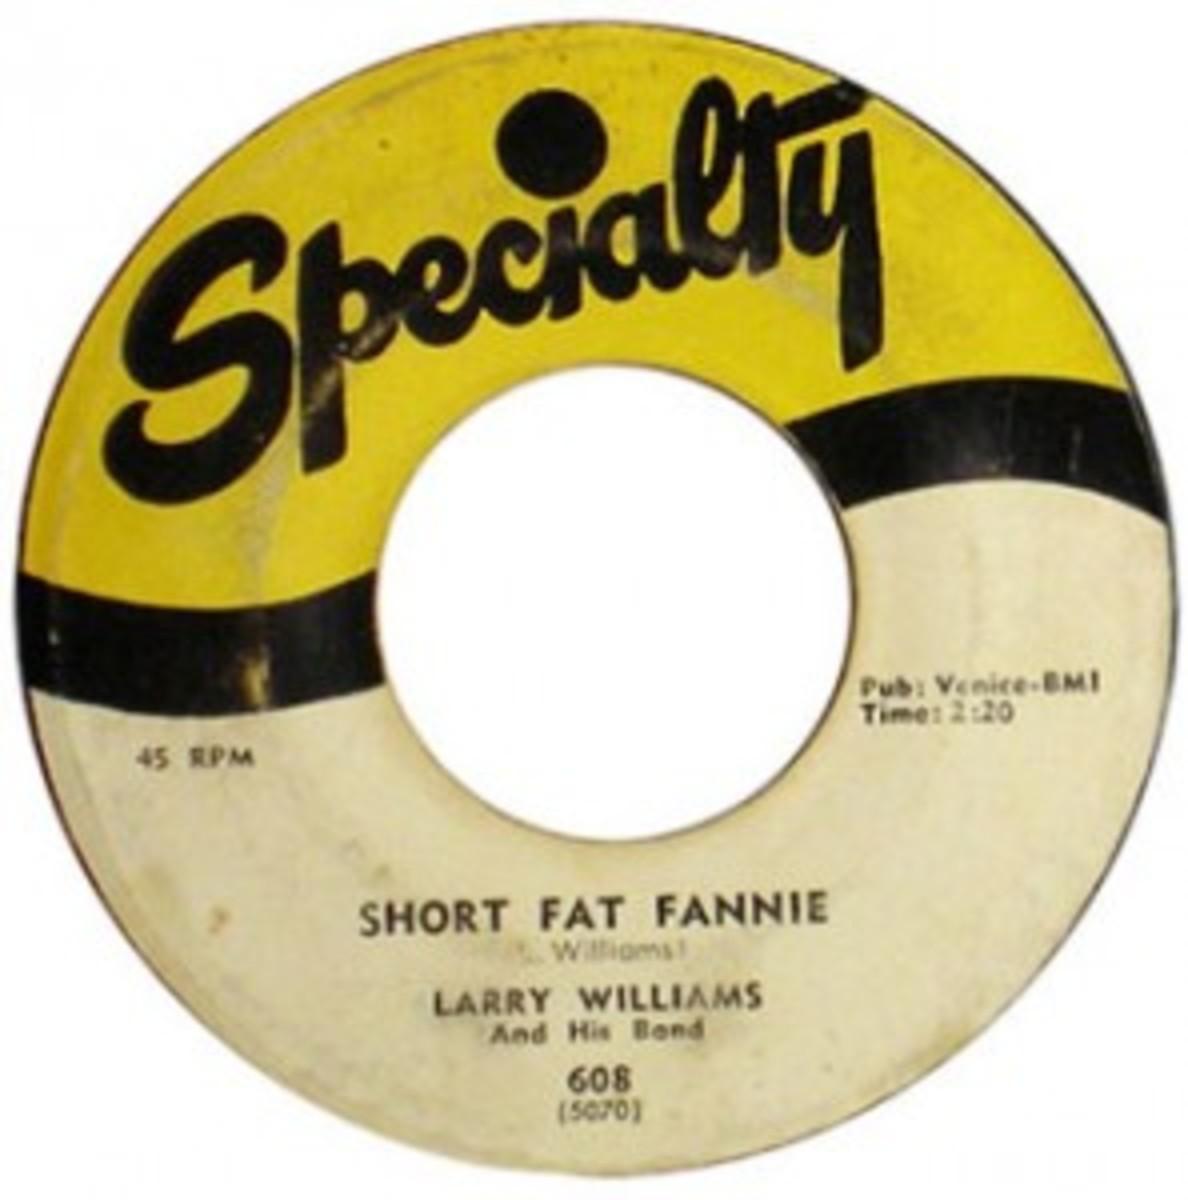 Larry Williams Short Fat Fannie